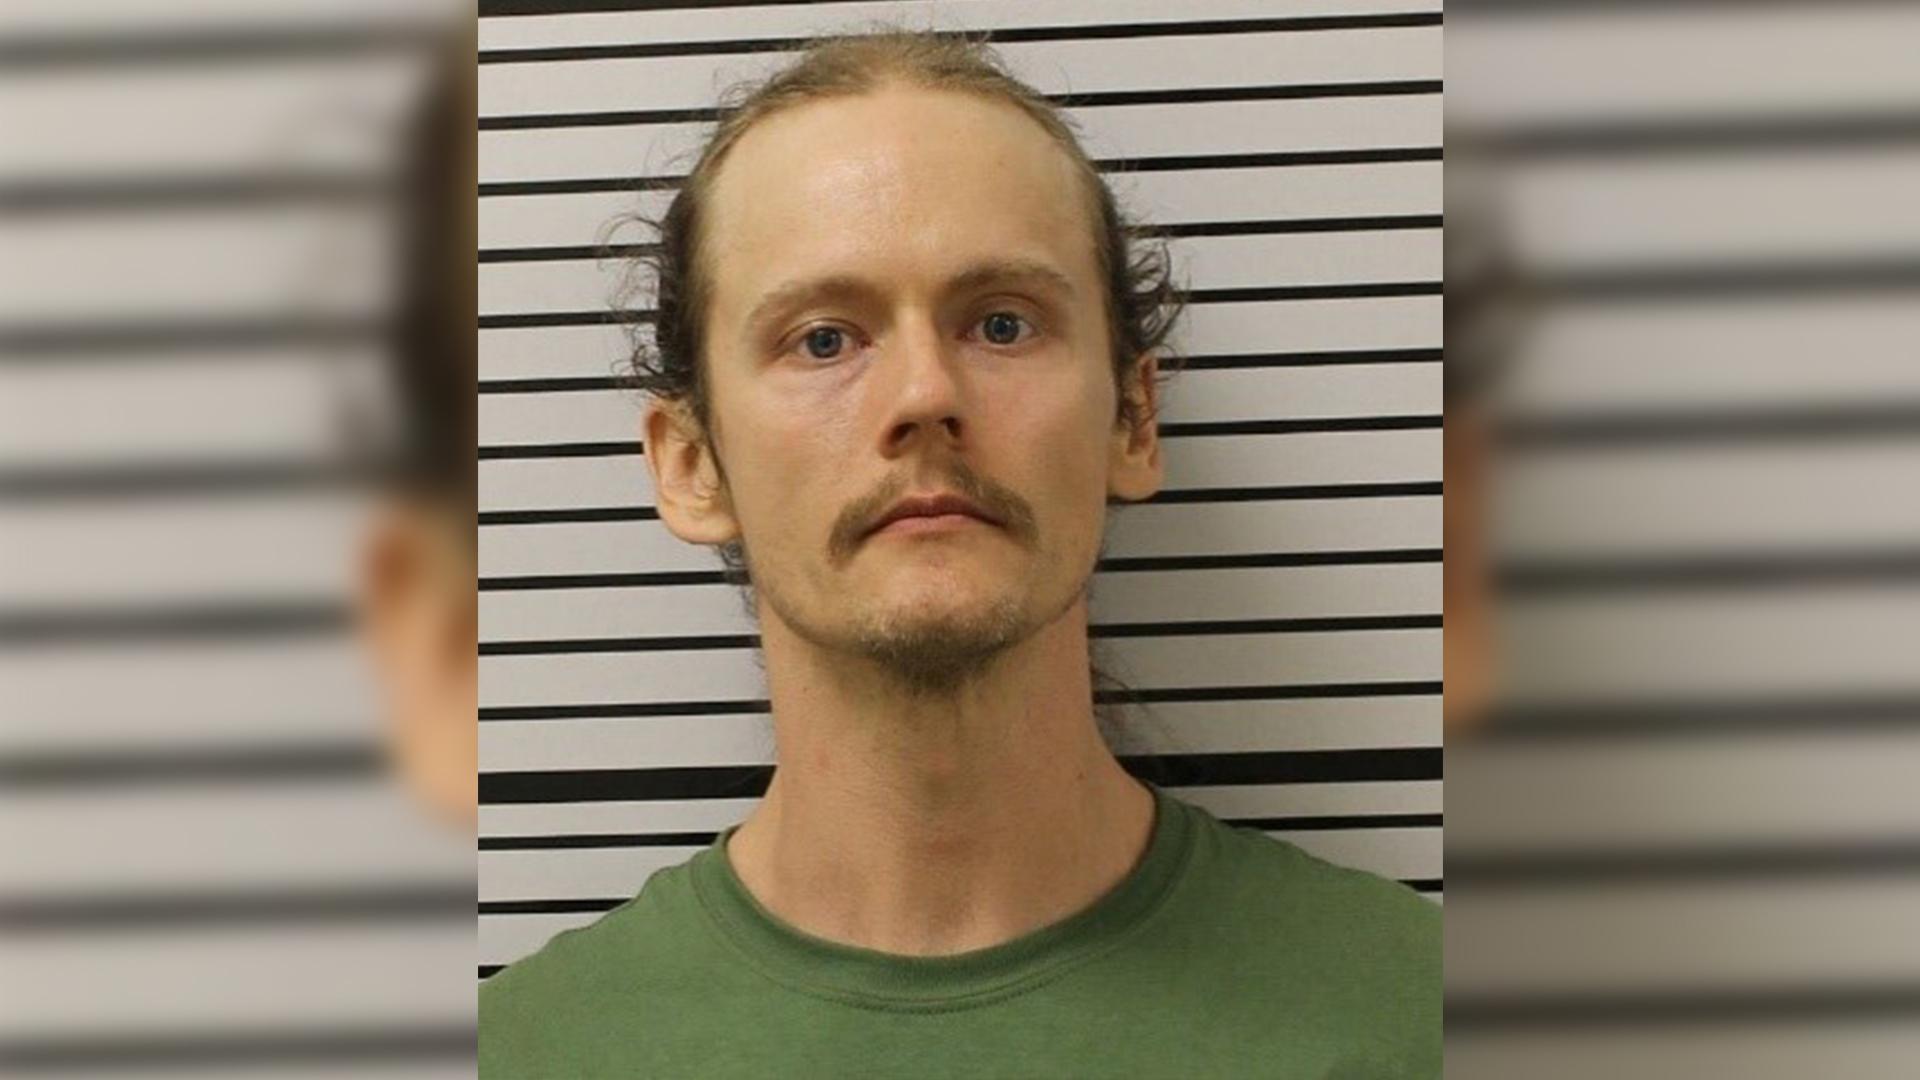 Joshua Isgrigg, 32 (image courtesy of Porterville Police).